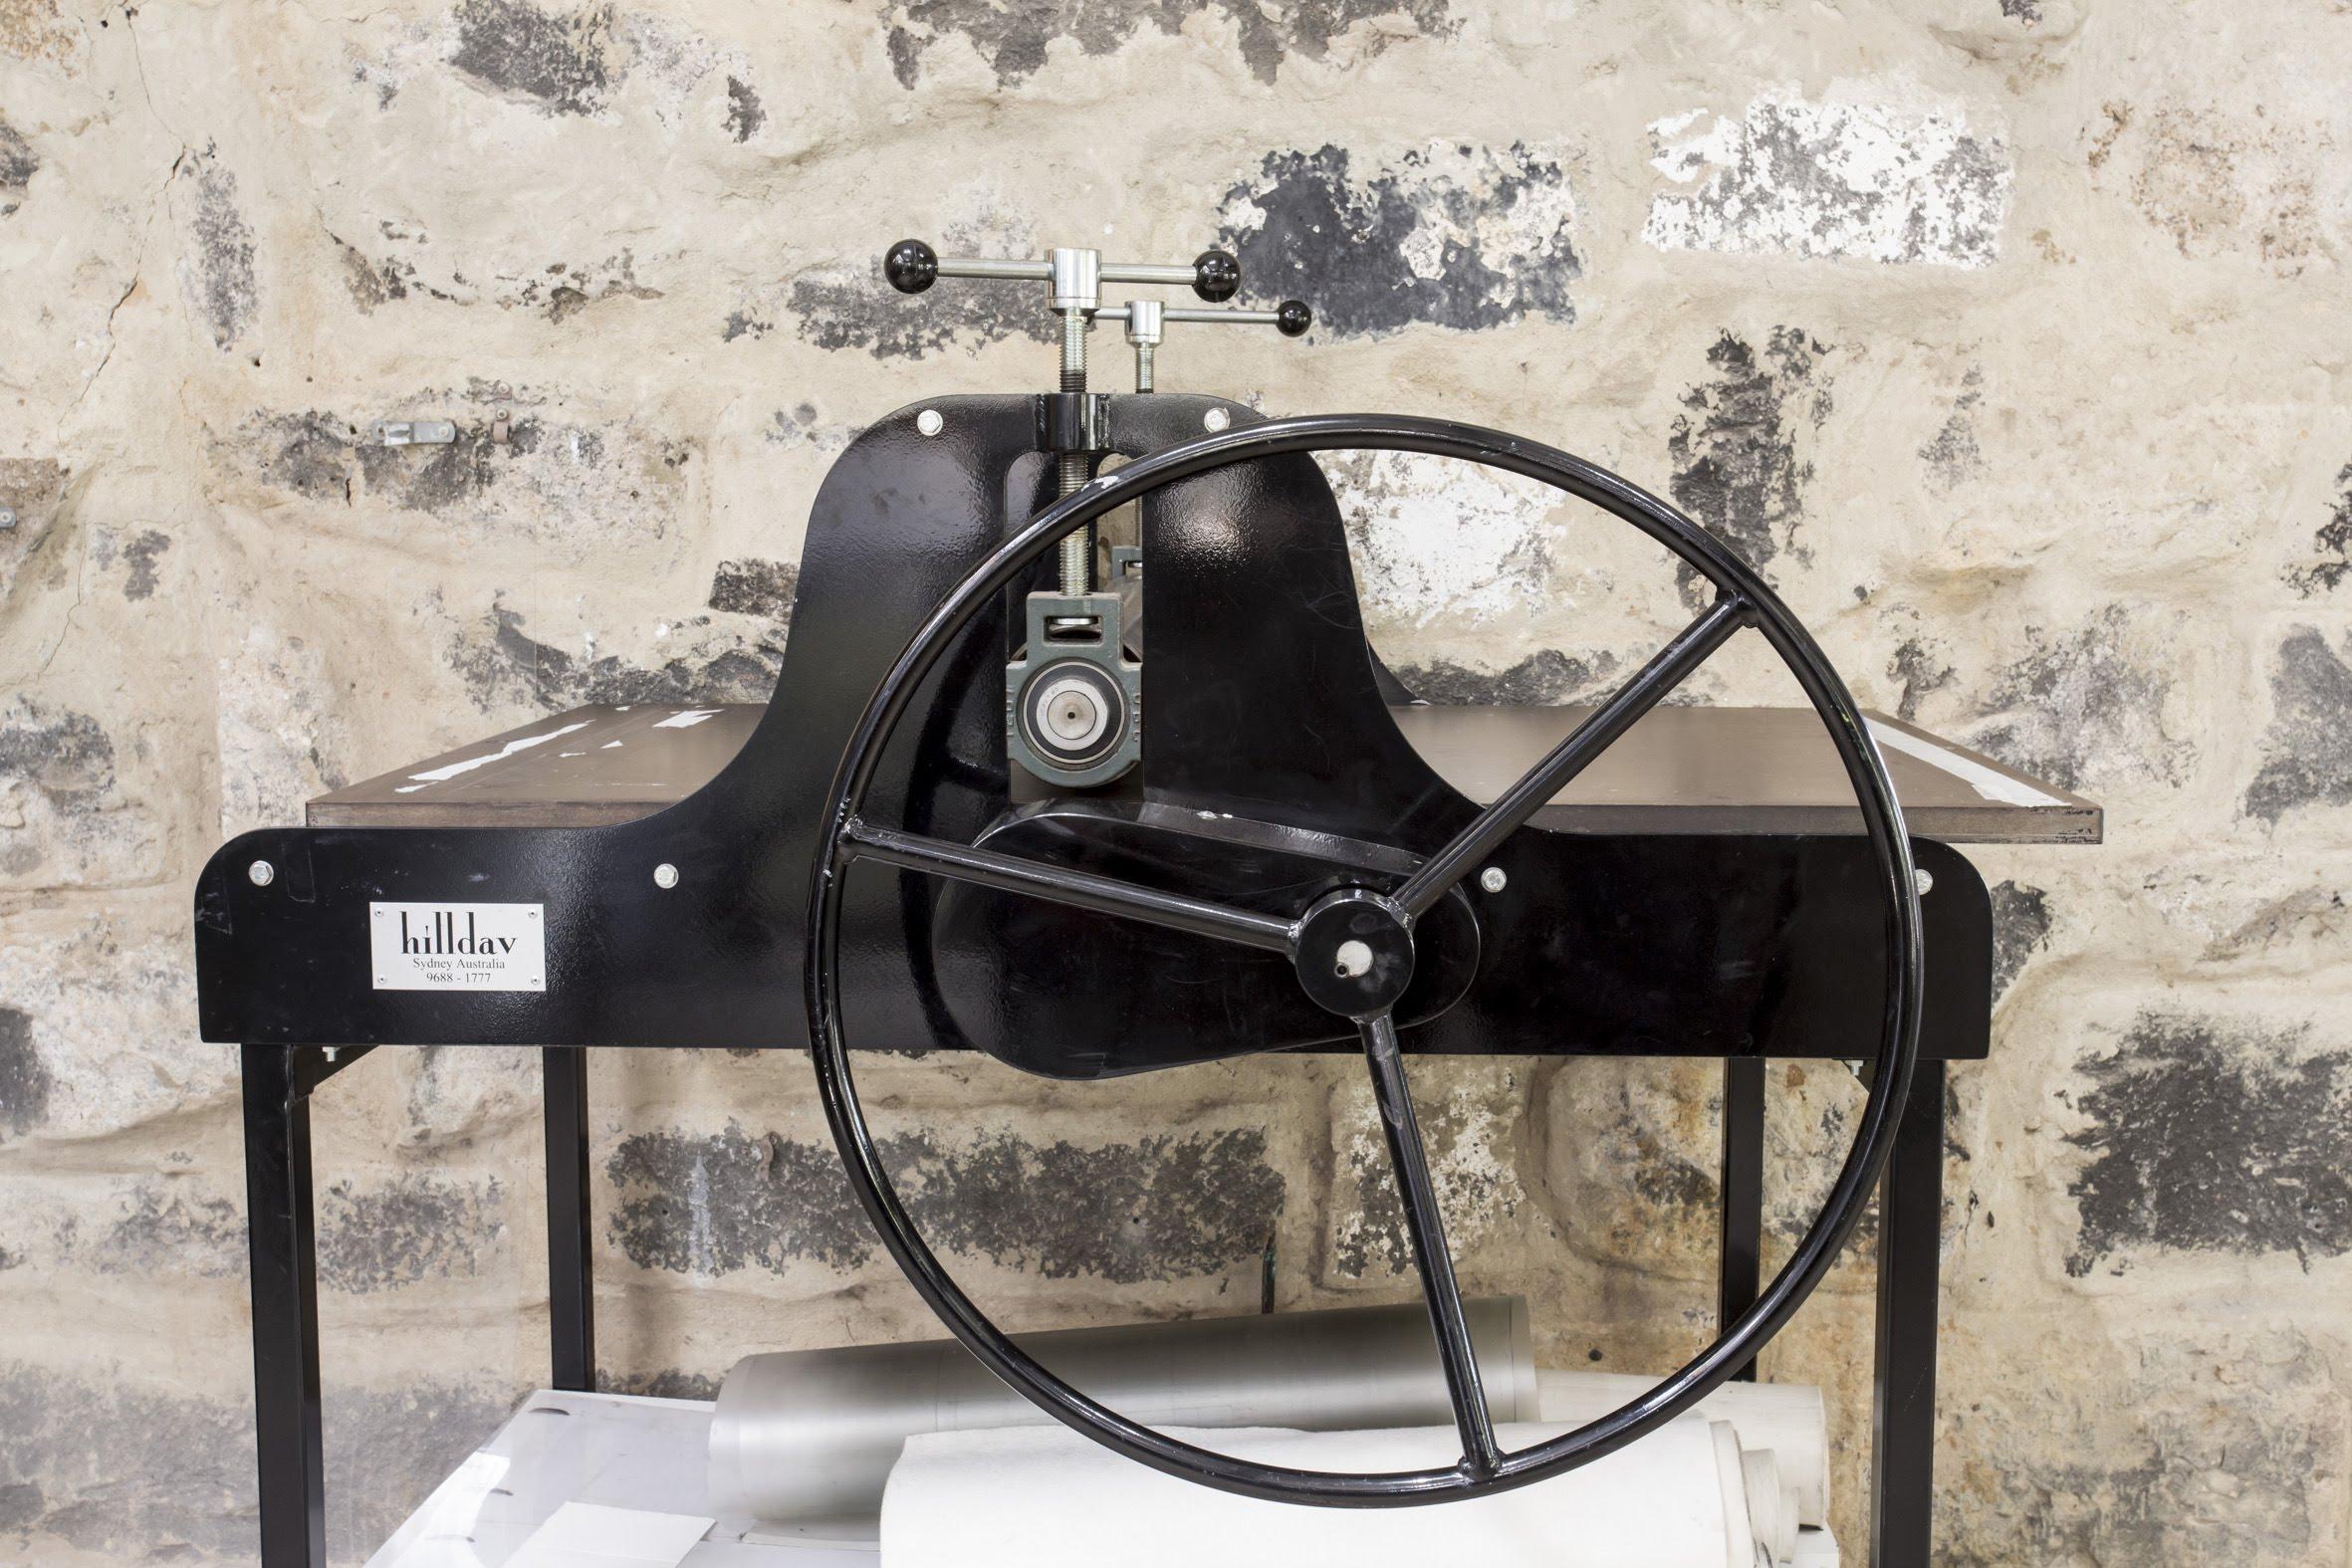 Hilldav etching press